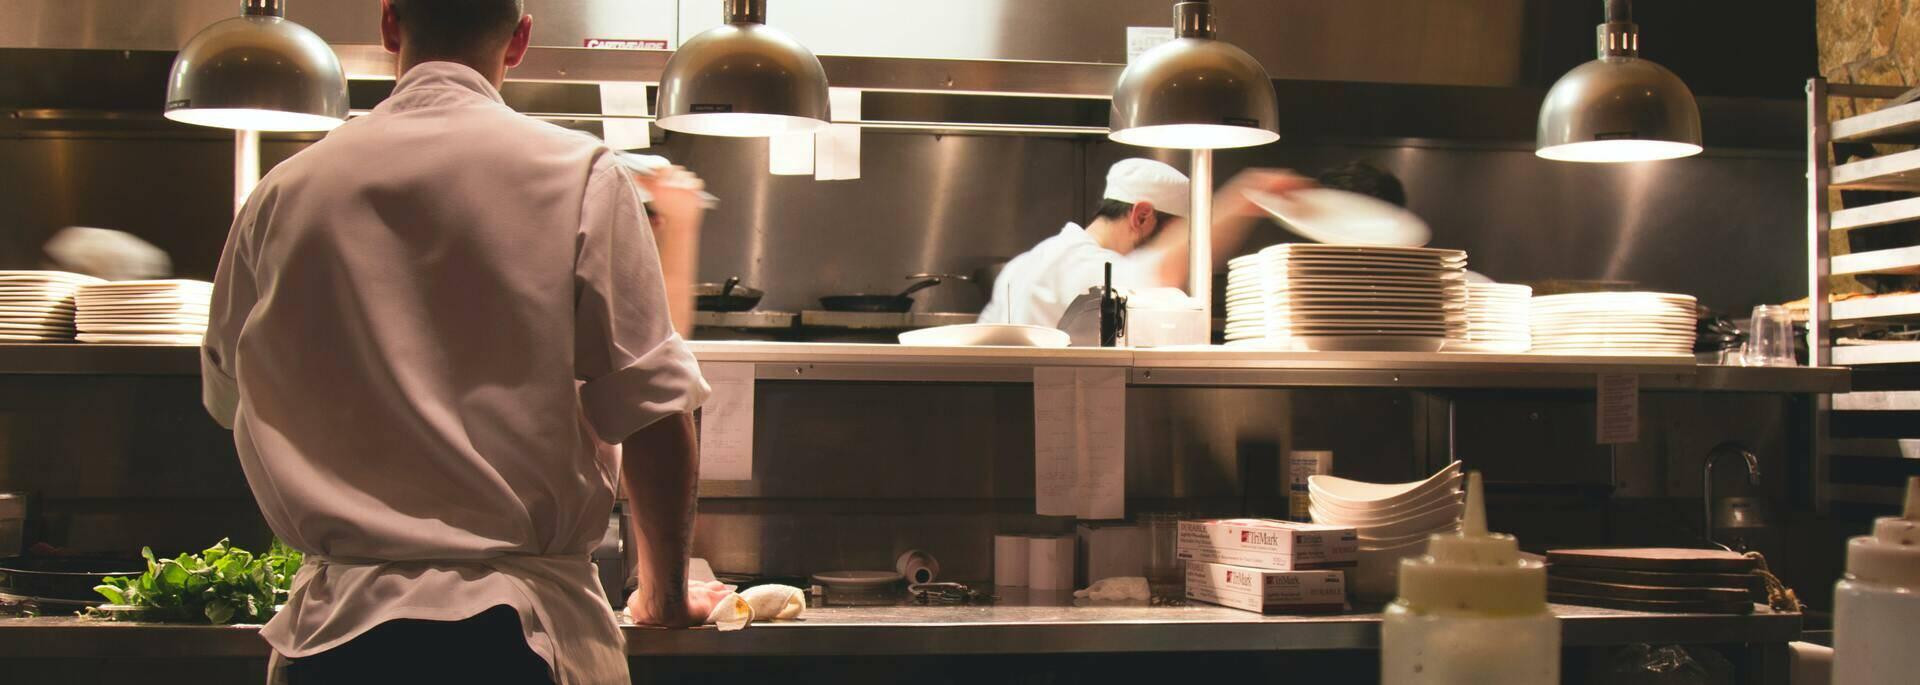 Cuisine d'un restaurant